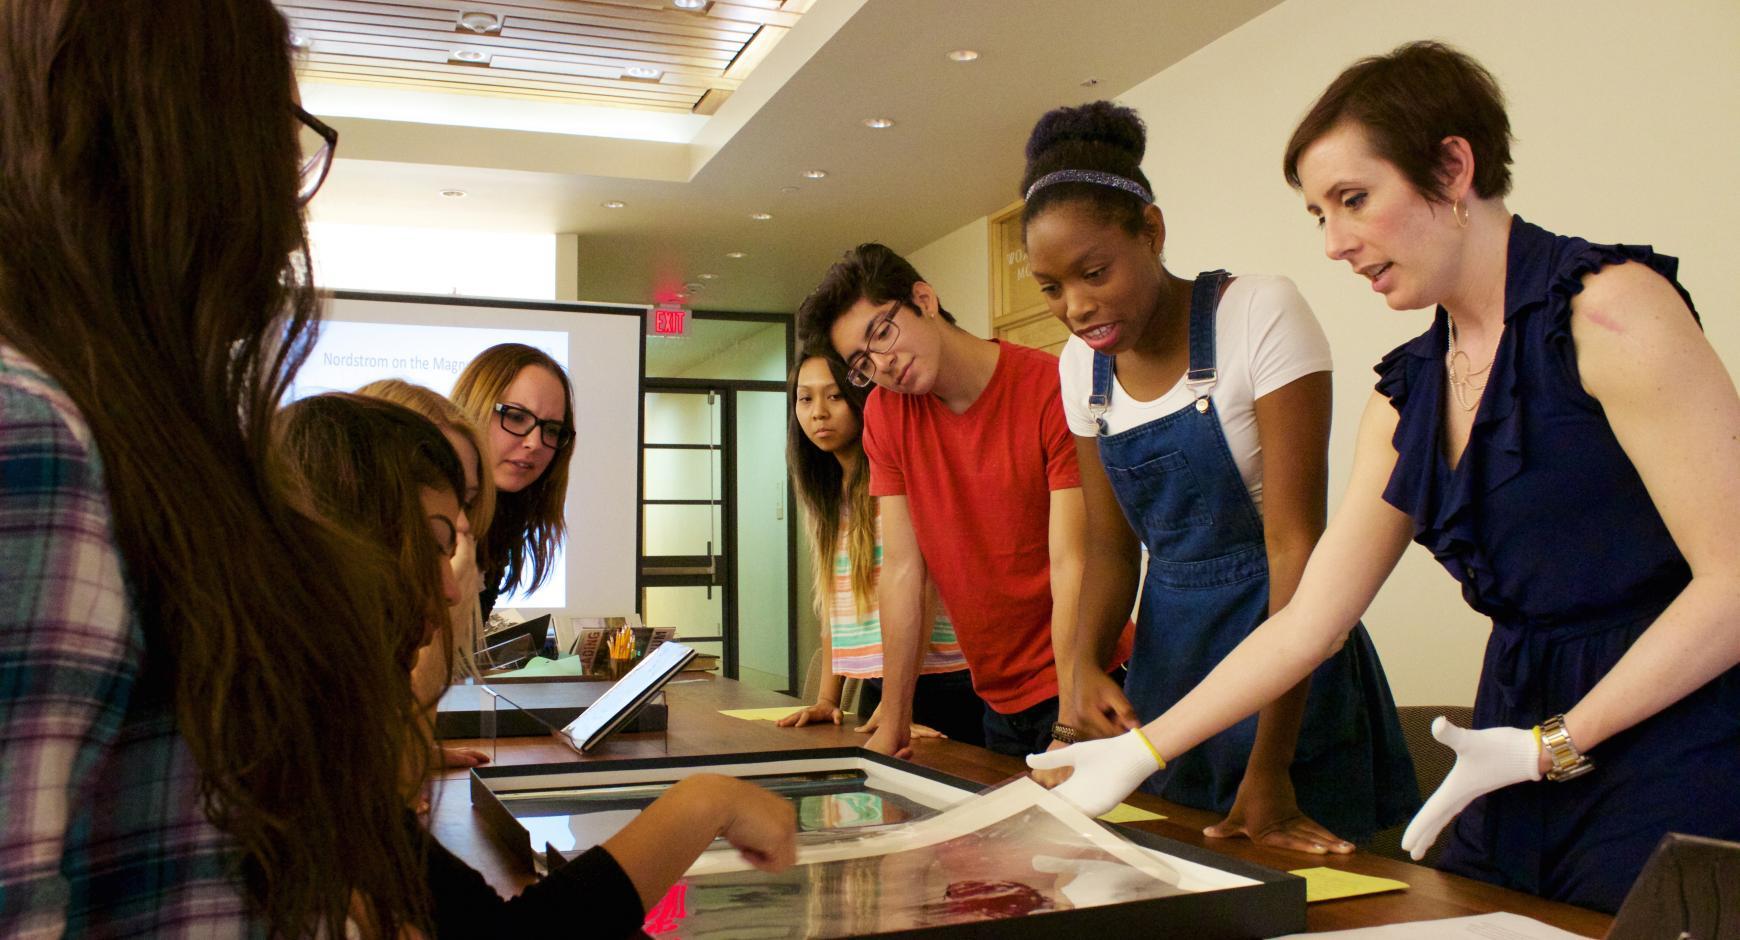 Students examine archival photos at the Harry Ransom Center